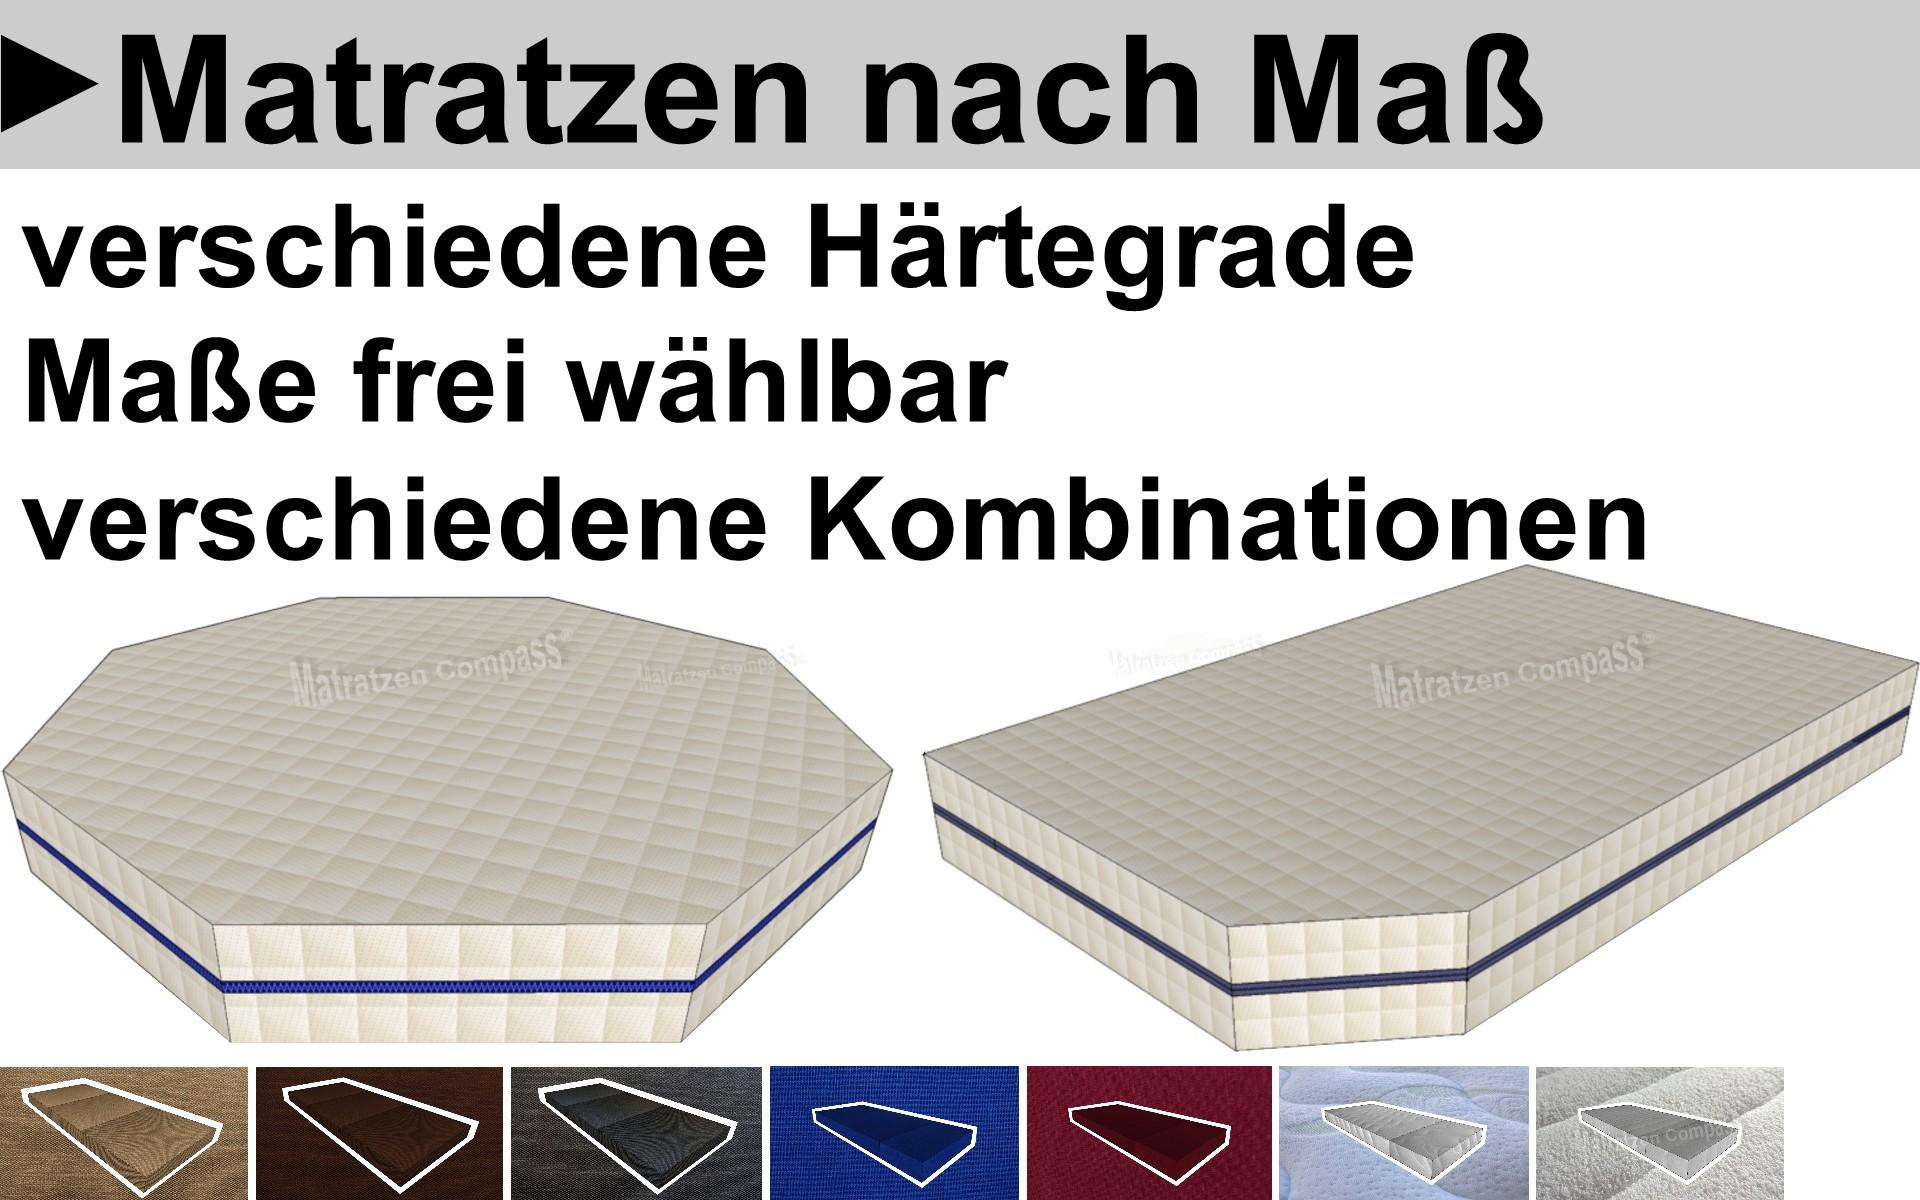 Matratze-nach-Mass-Matratzen-nach-Mass-Matratzen-Massanfertigung-Matratze-Massanfertigung-Mass-Matratze-Matratze-Sondermass-Matratze-Wunschmass-Matratzen-Compass